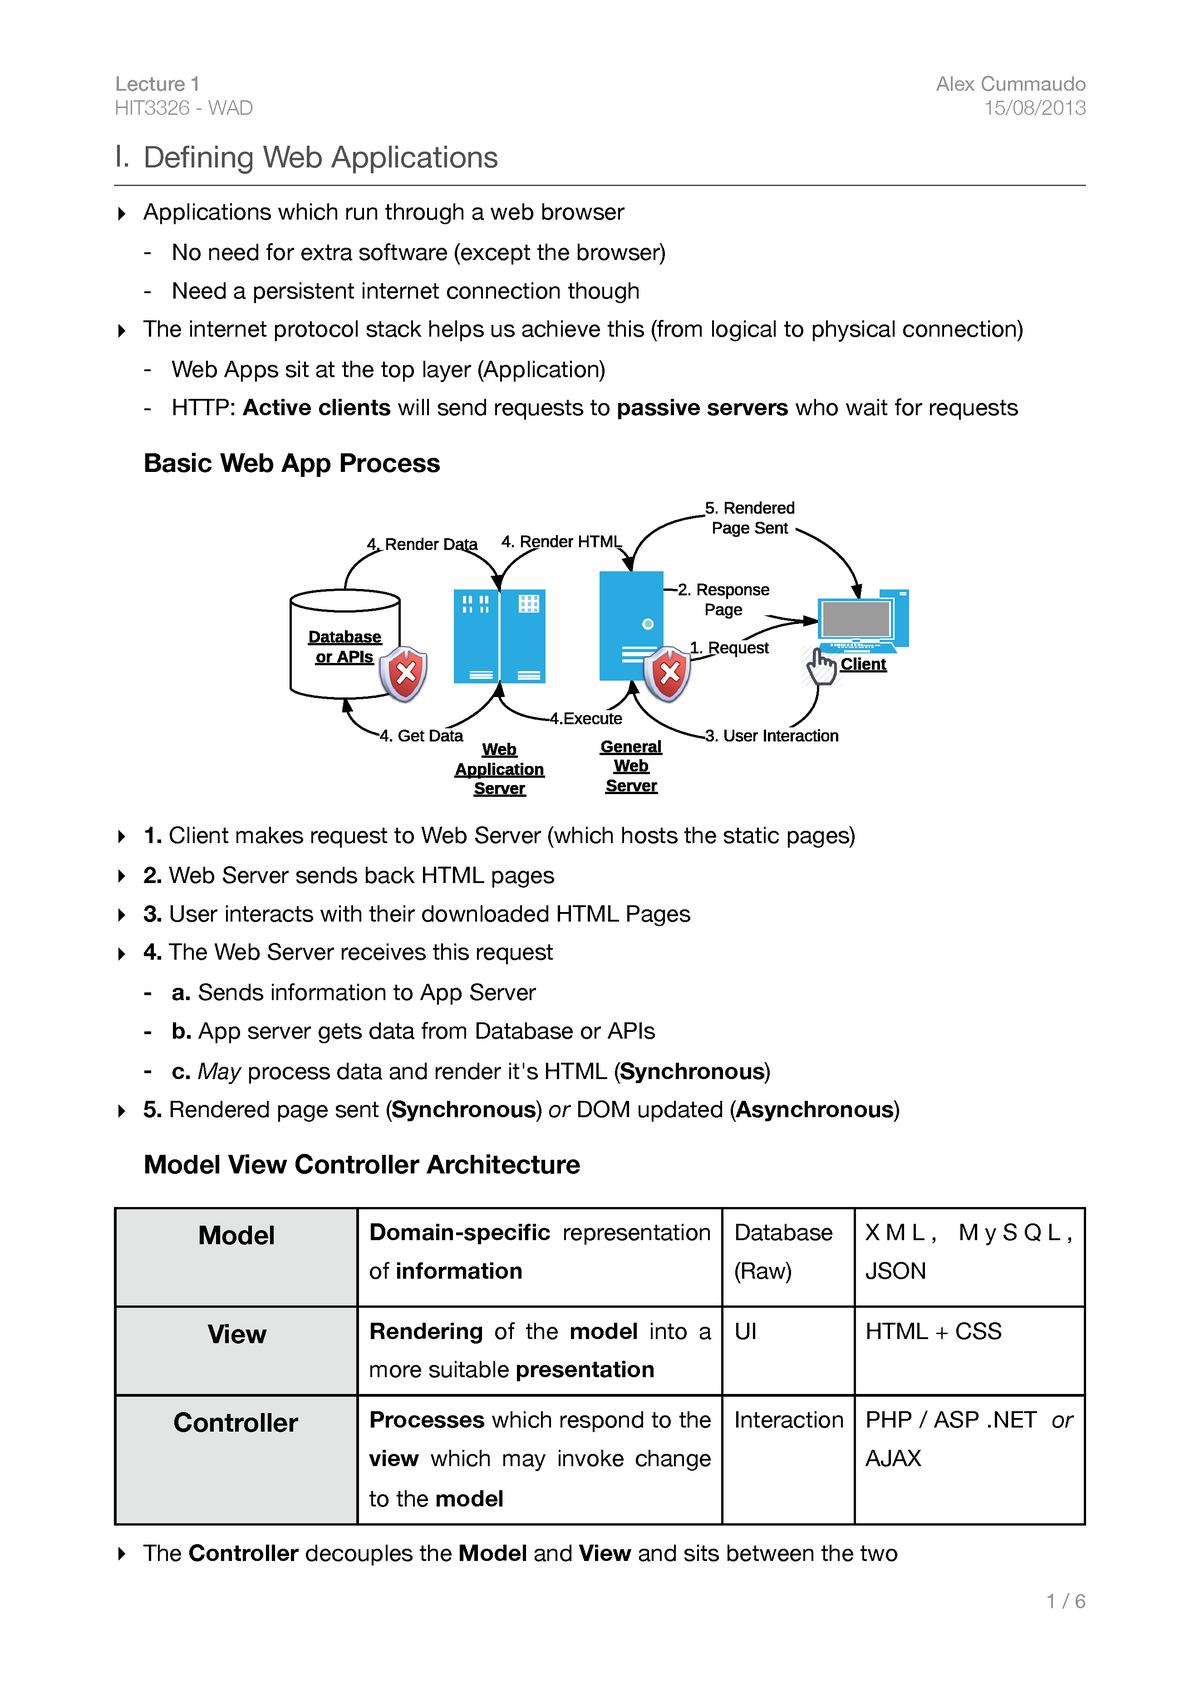 Lecture Notes, Web Application Development - COS30020: Web